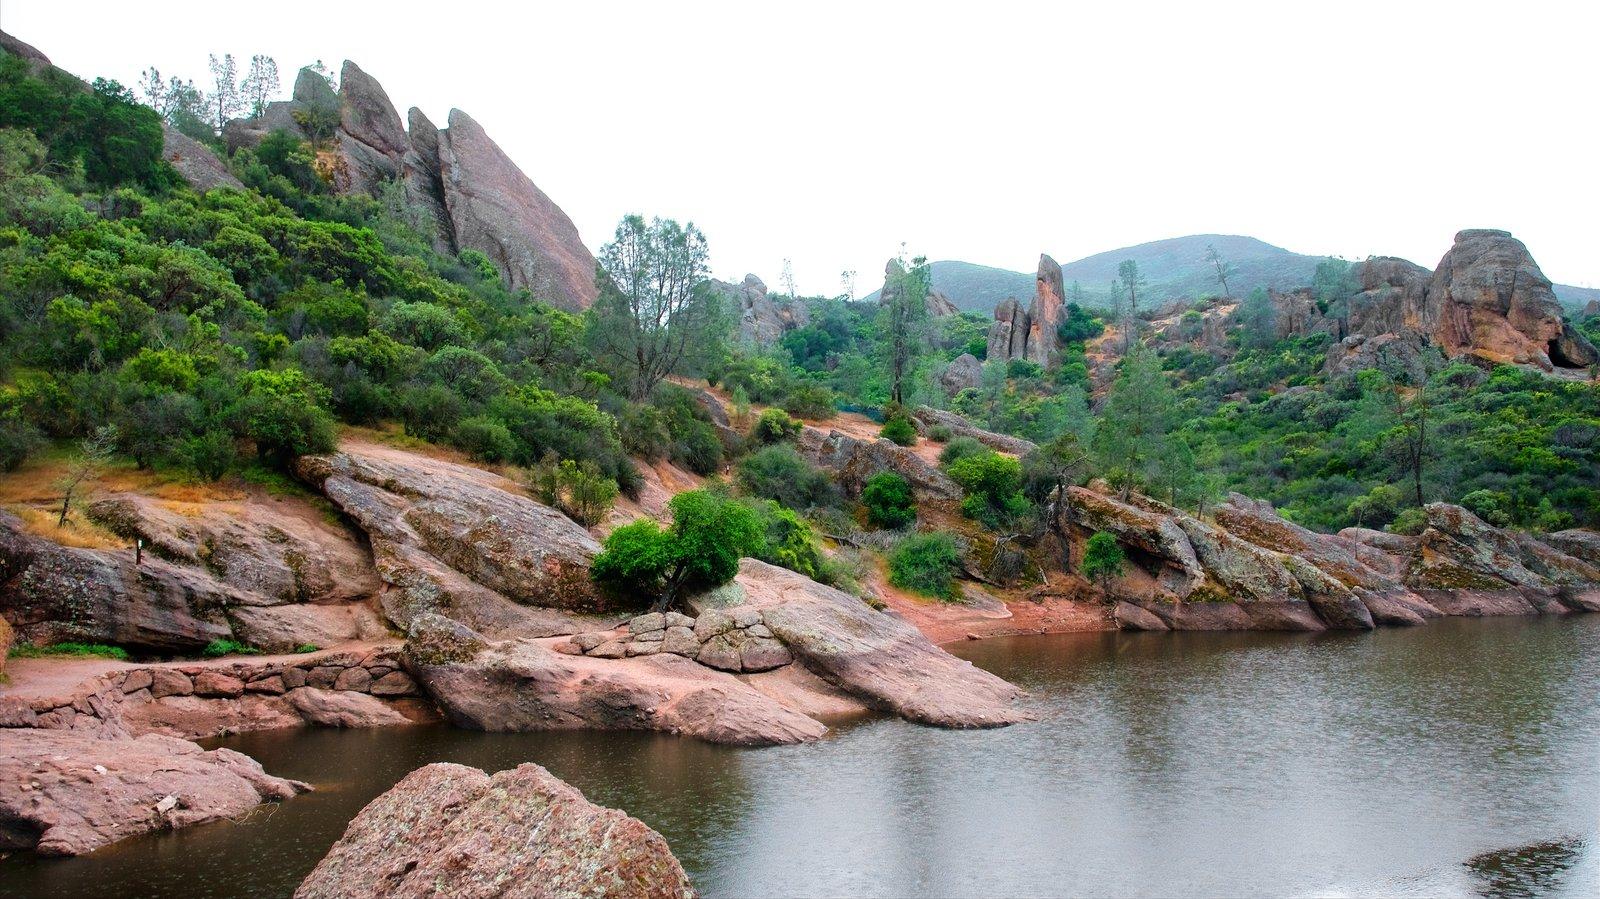 Pinnacles National Park caracterizando um lago ou charco e floresta tropical